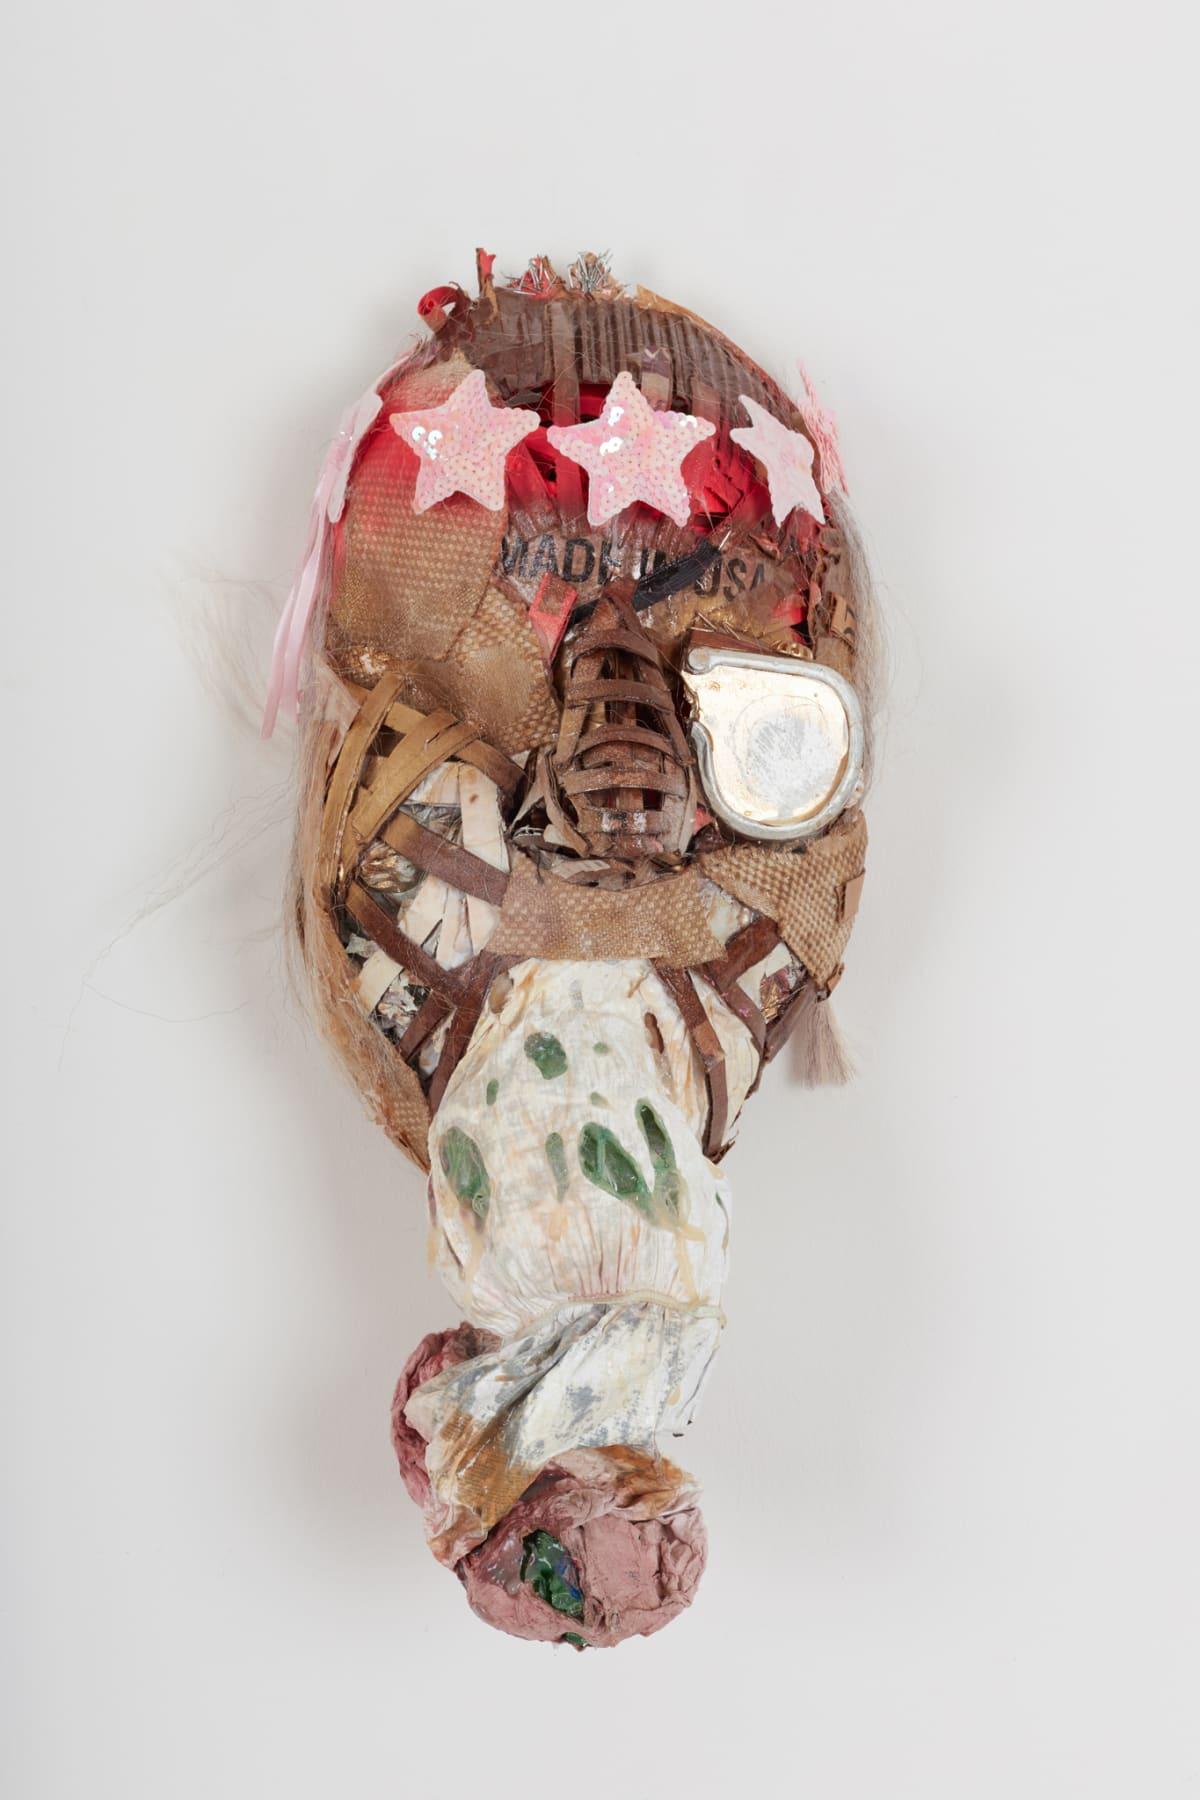 Lavar Munroe, Small Solider War Mask: P.O.W, 2018